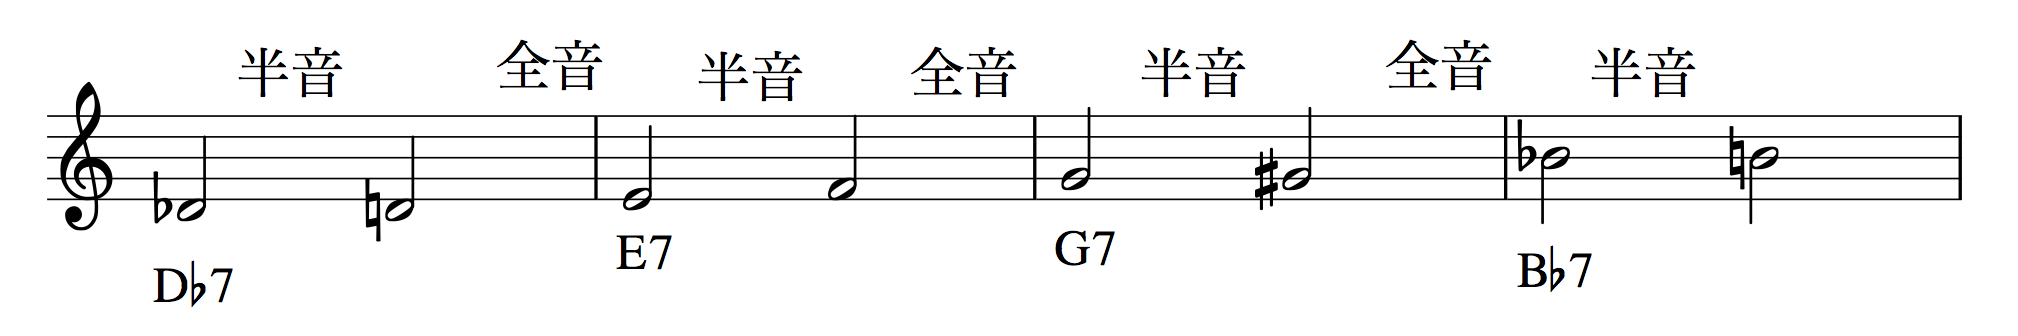 conbination-diminish-2